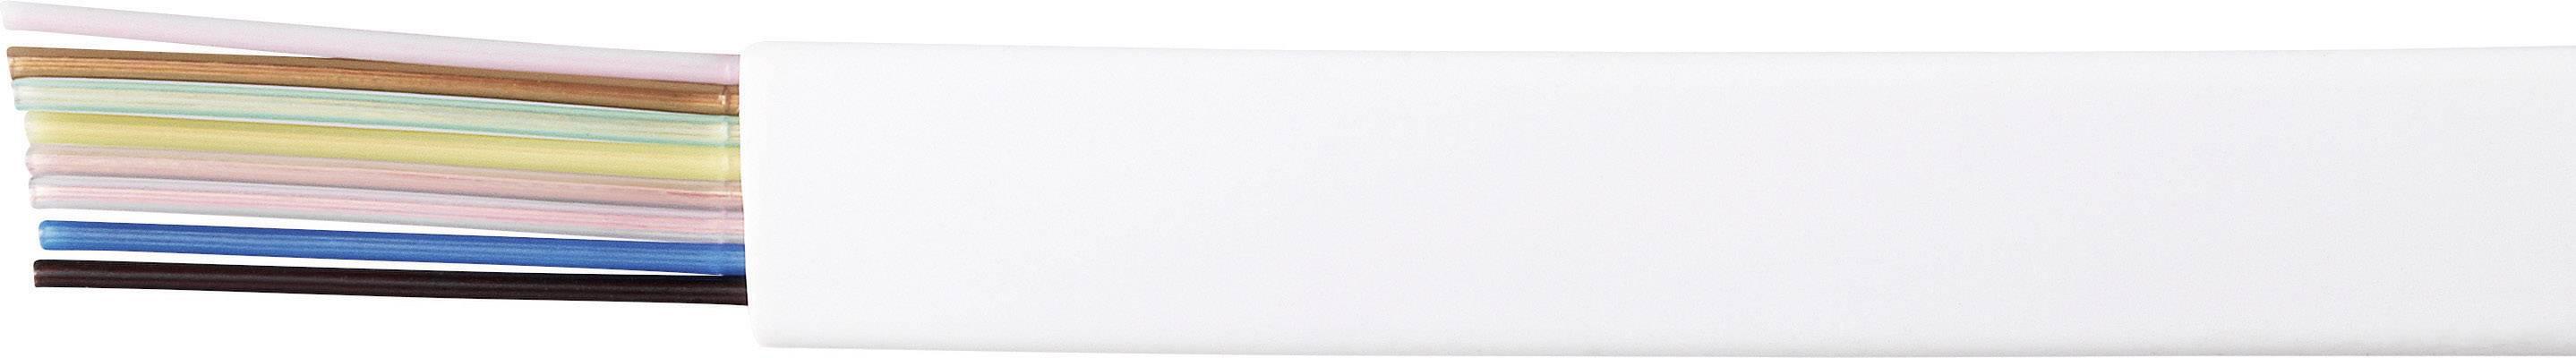 Telefonní kabel LiYY, plochý, 8 x 0,14 mm², bílá, 1 m